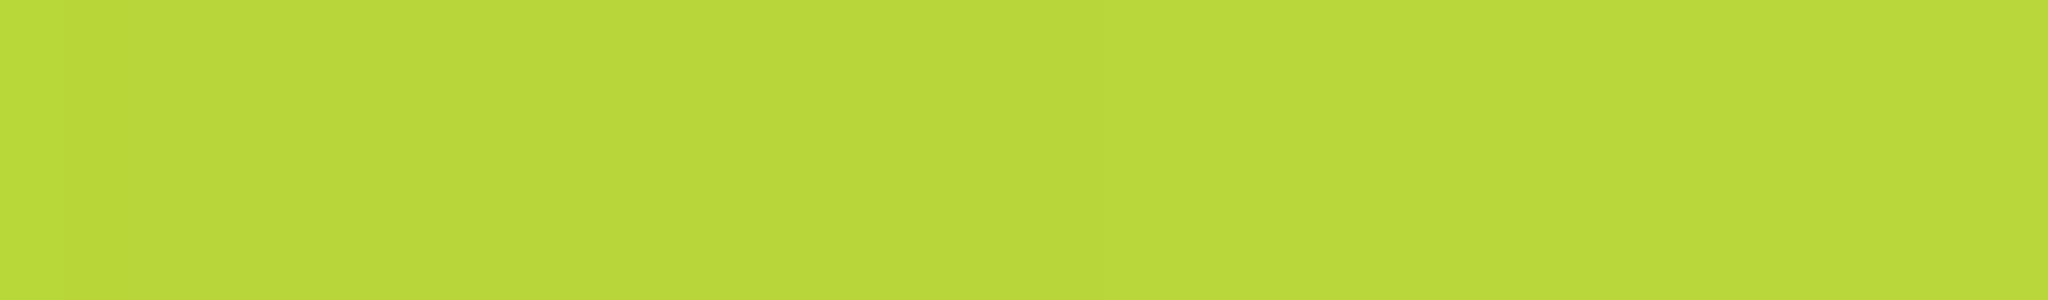 HU 16568 ABS Kante Verde Grün glatt Glanzgrad 90°